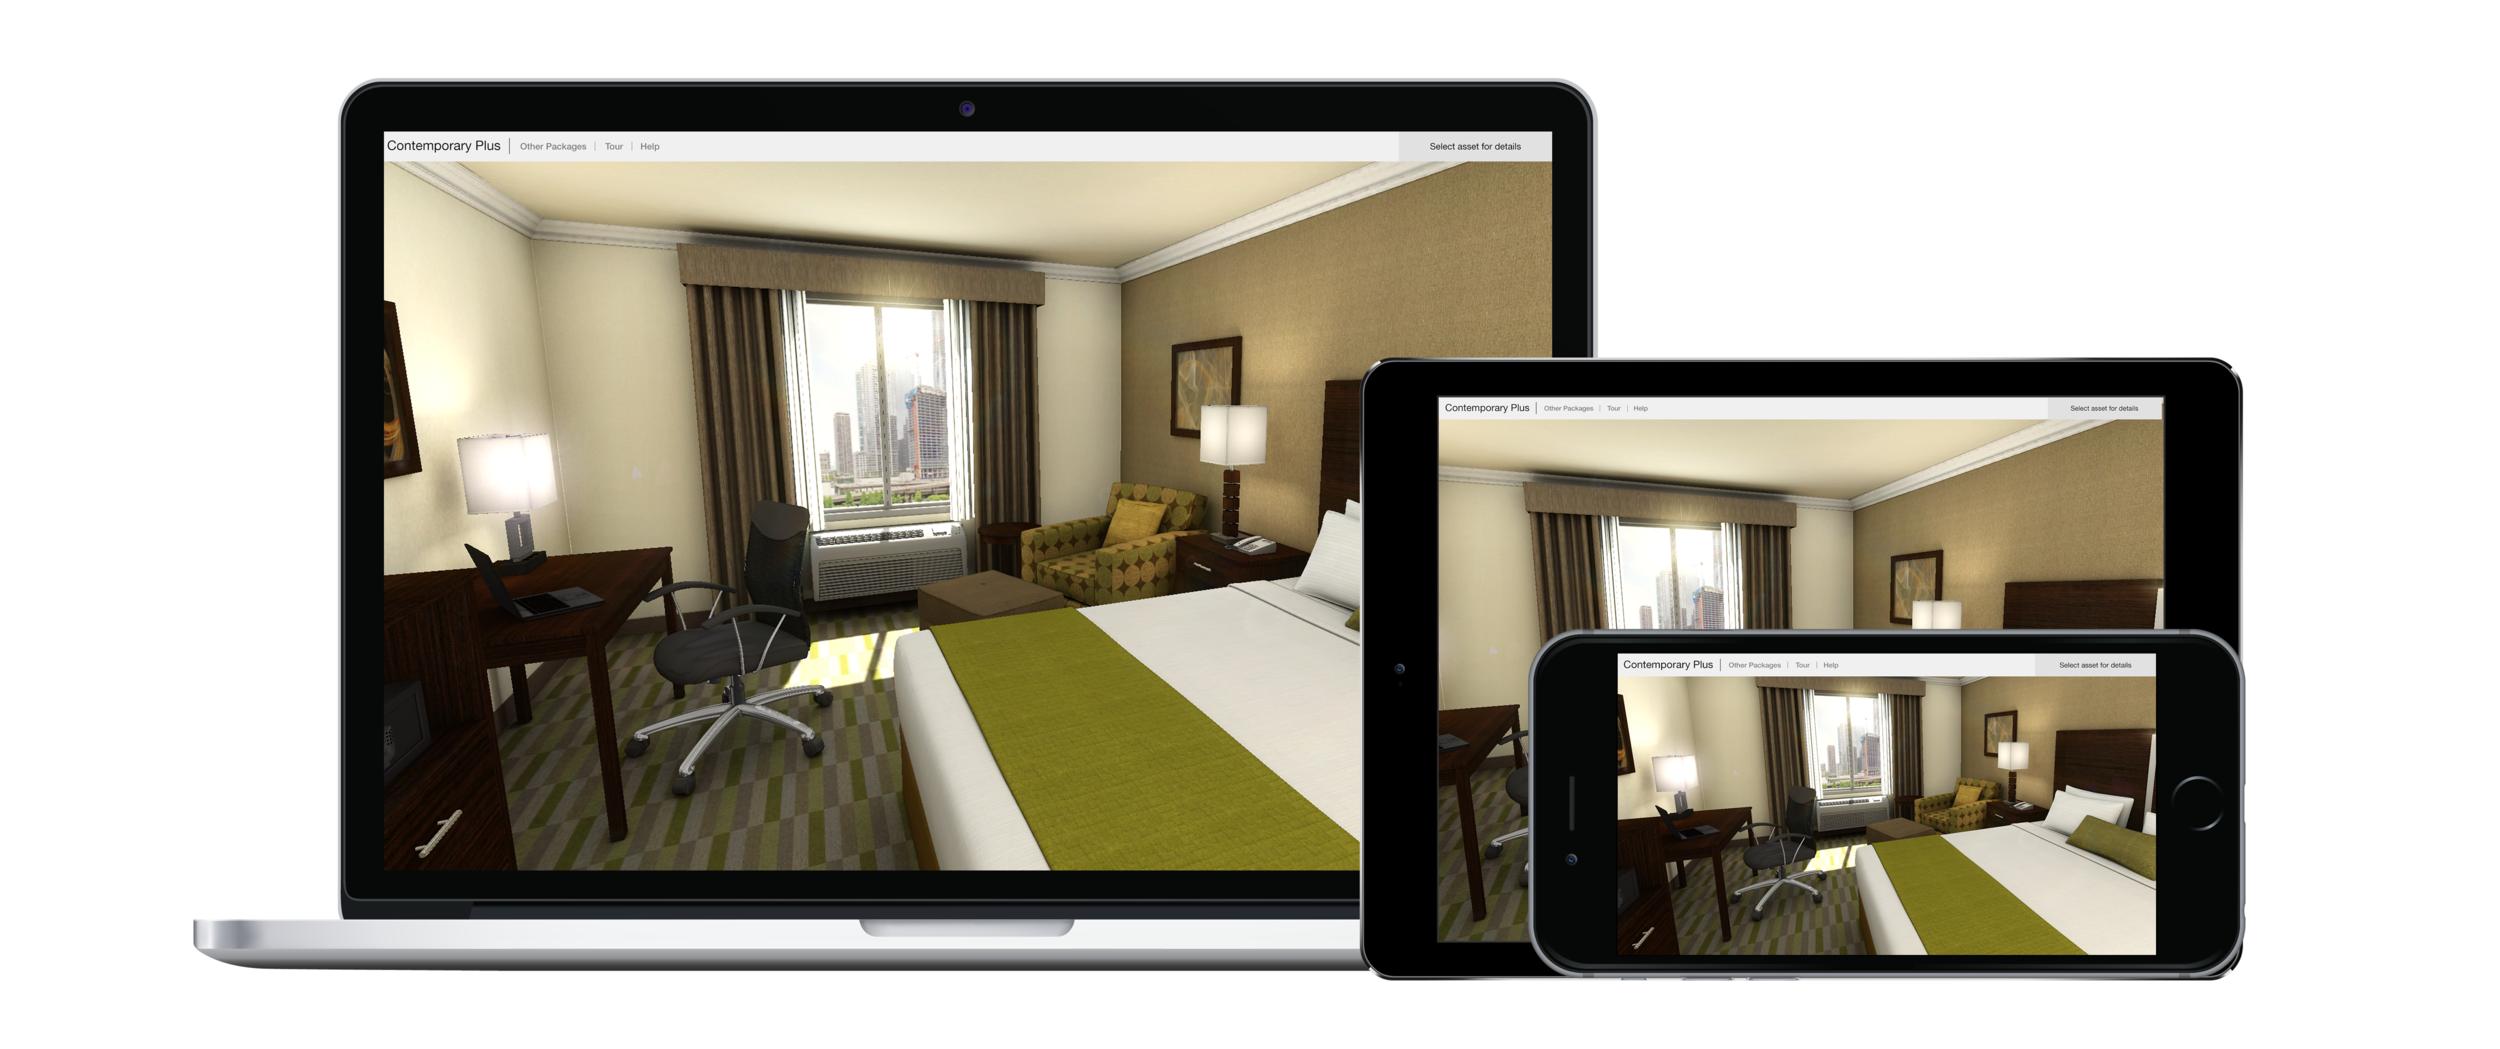 asteriskos-design-bestwestern-render-3d-vray-realtime.png